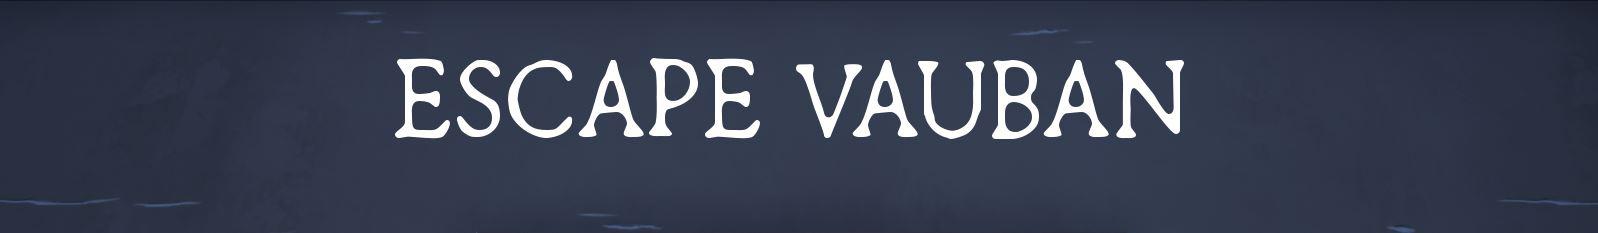 Escape Vauban